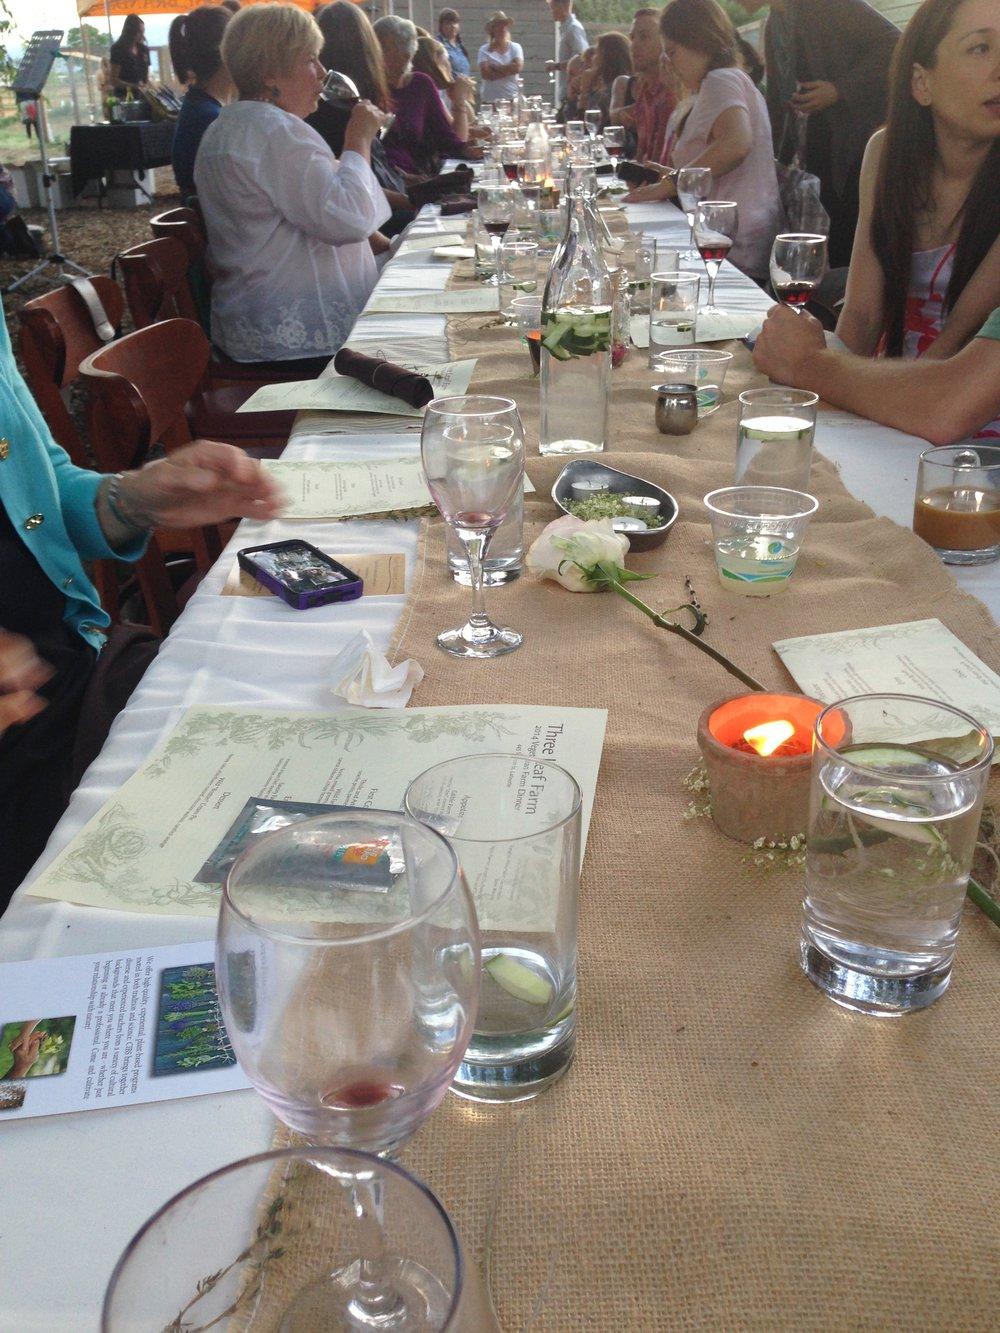 Marissa Chastain - Spiritual Event Farm Dinner.jpg